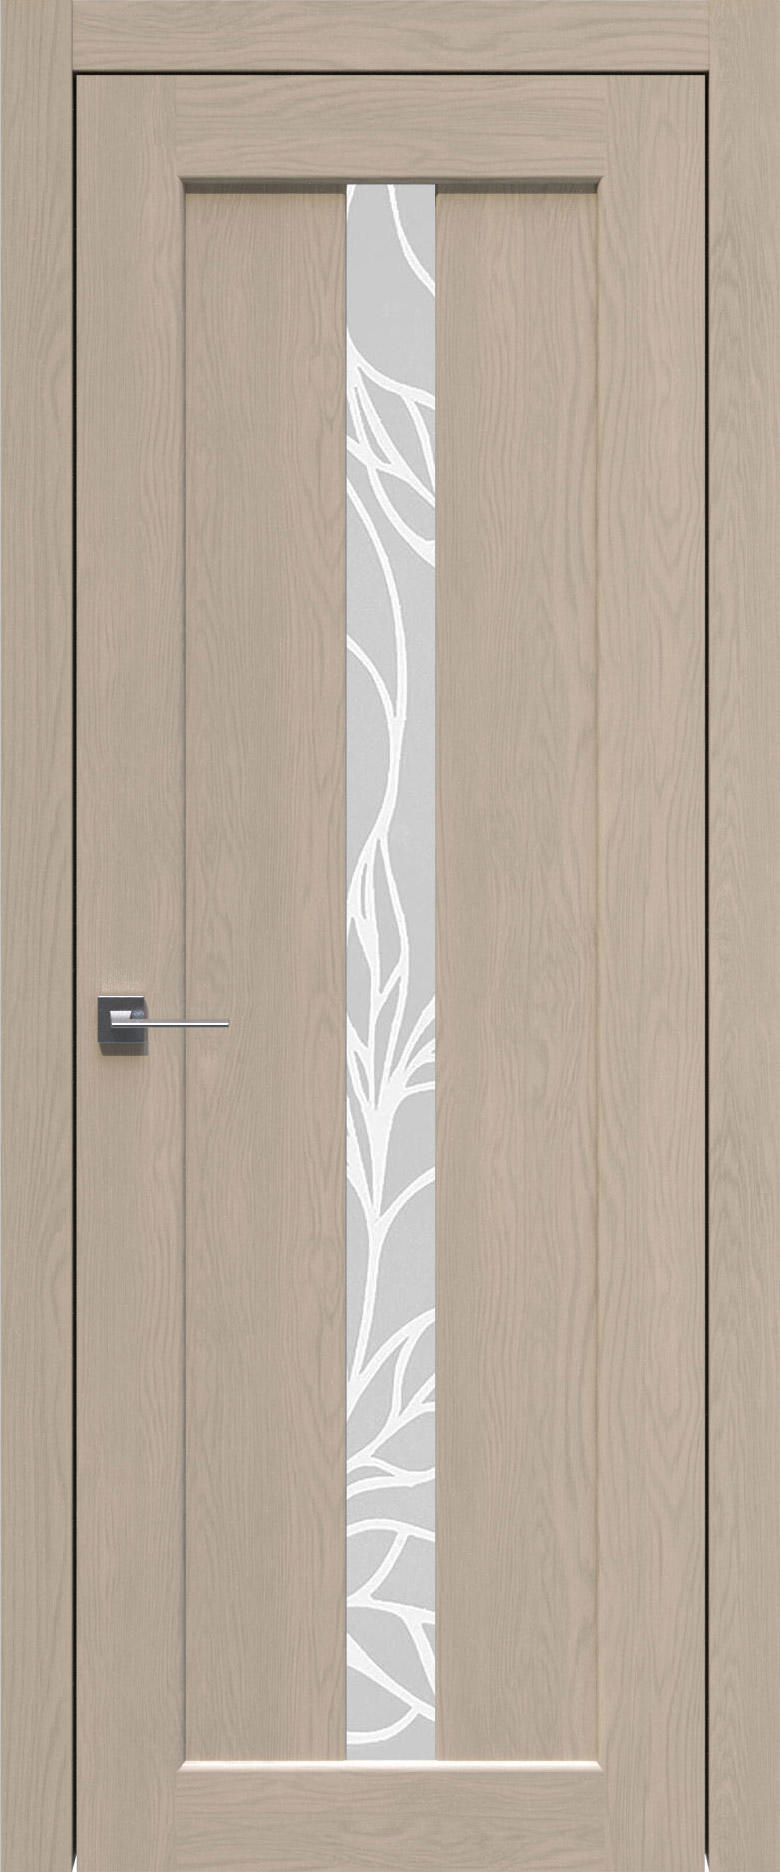 Pianta цвет - Дуб муар Без стекла (ДГ)